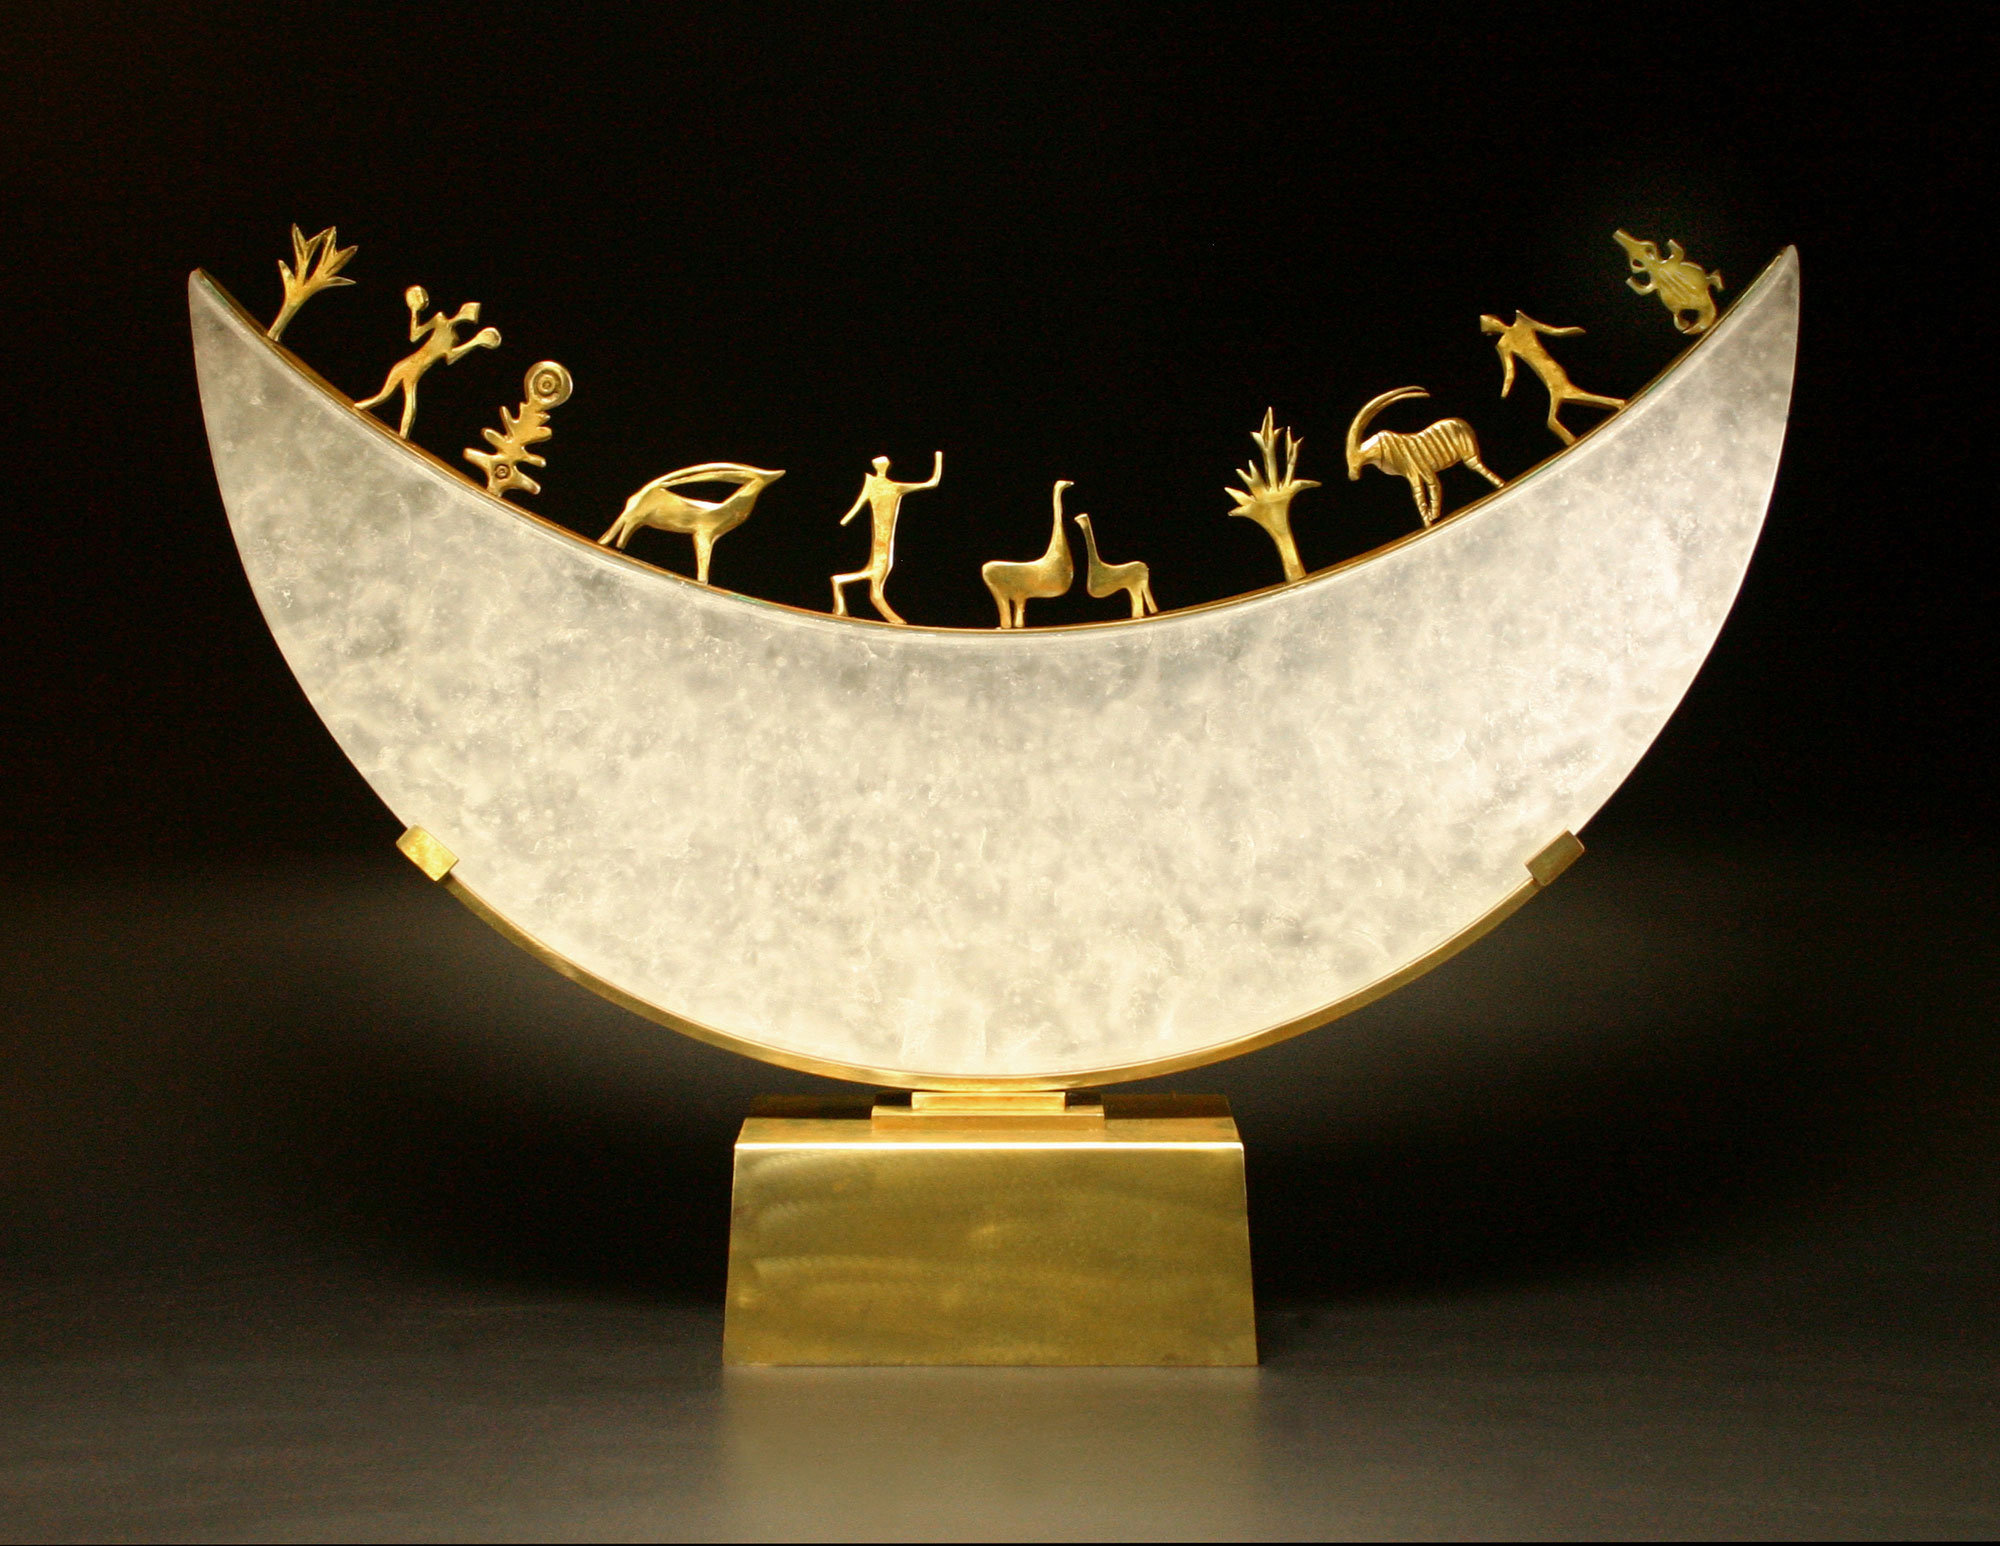 Glass Moon Sculpture By Georgia Pozycinski And Joseph